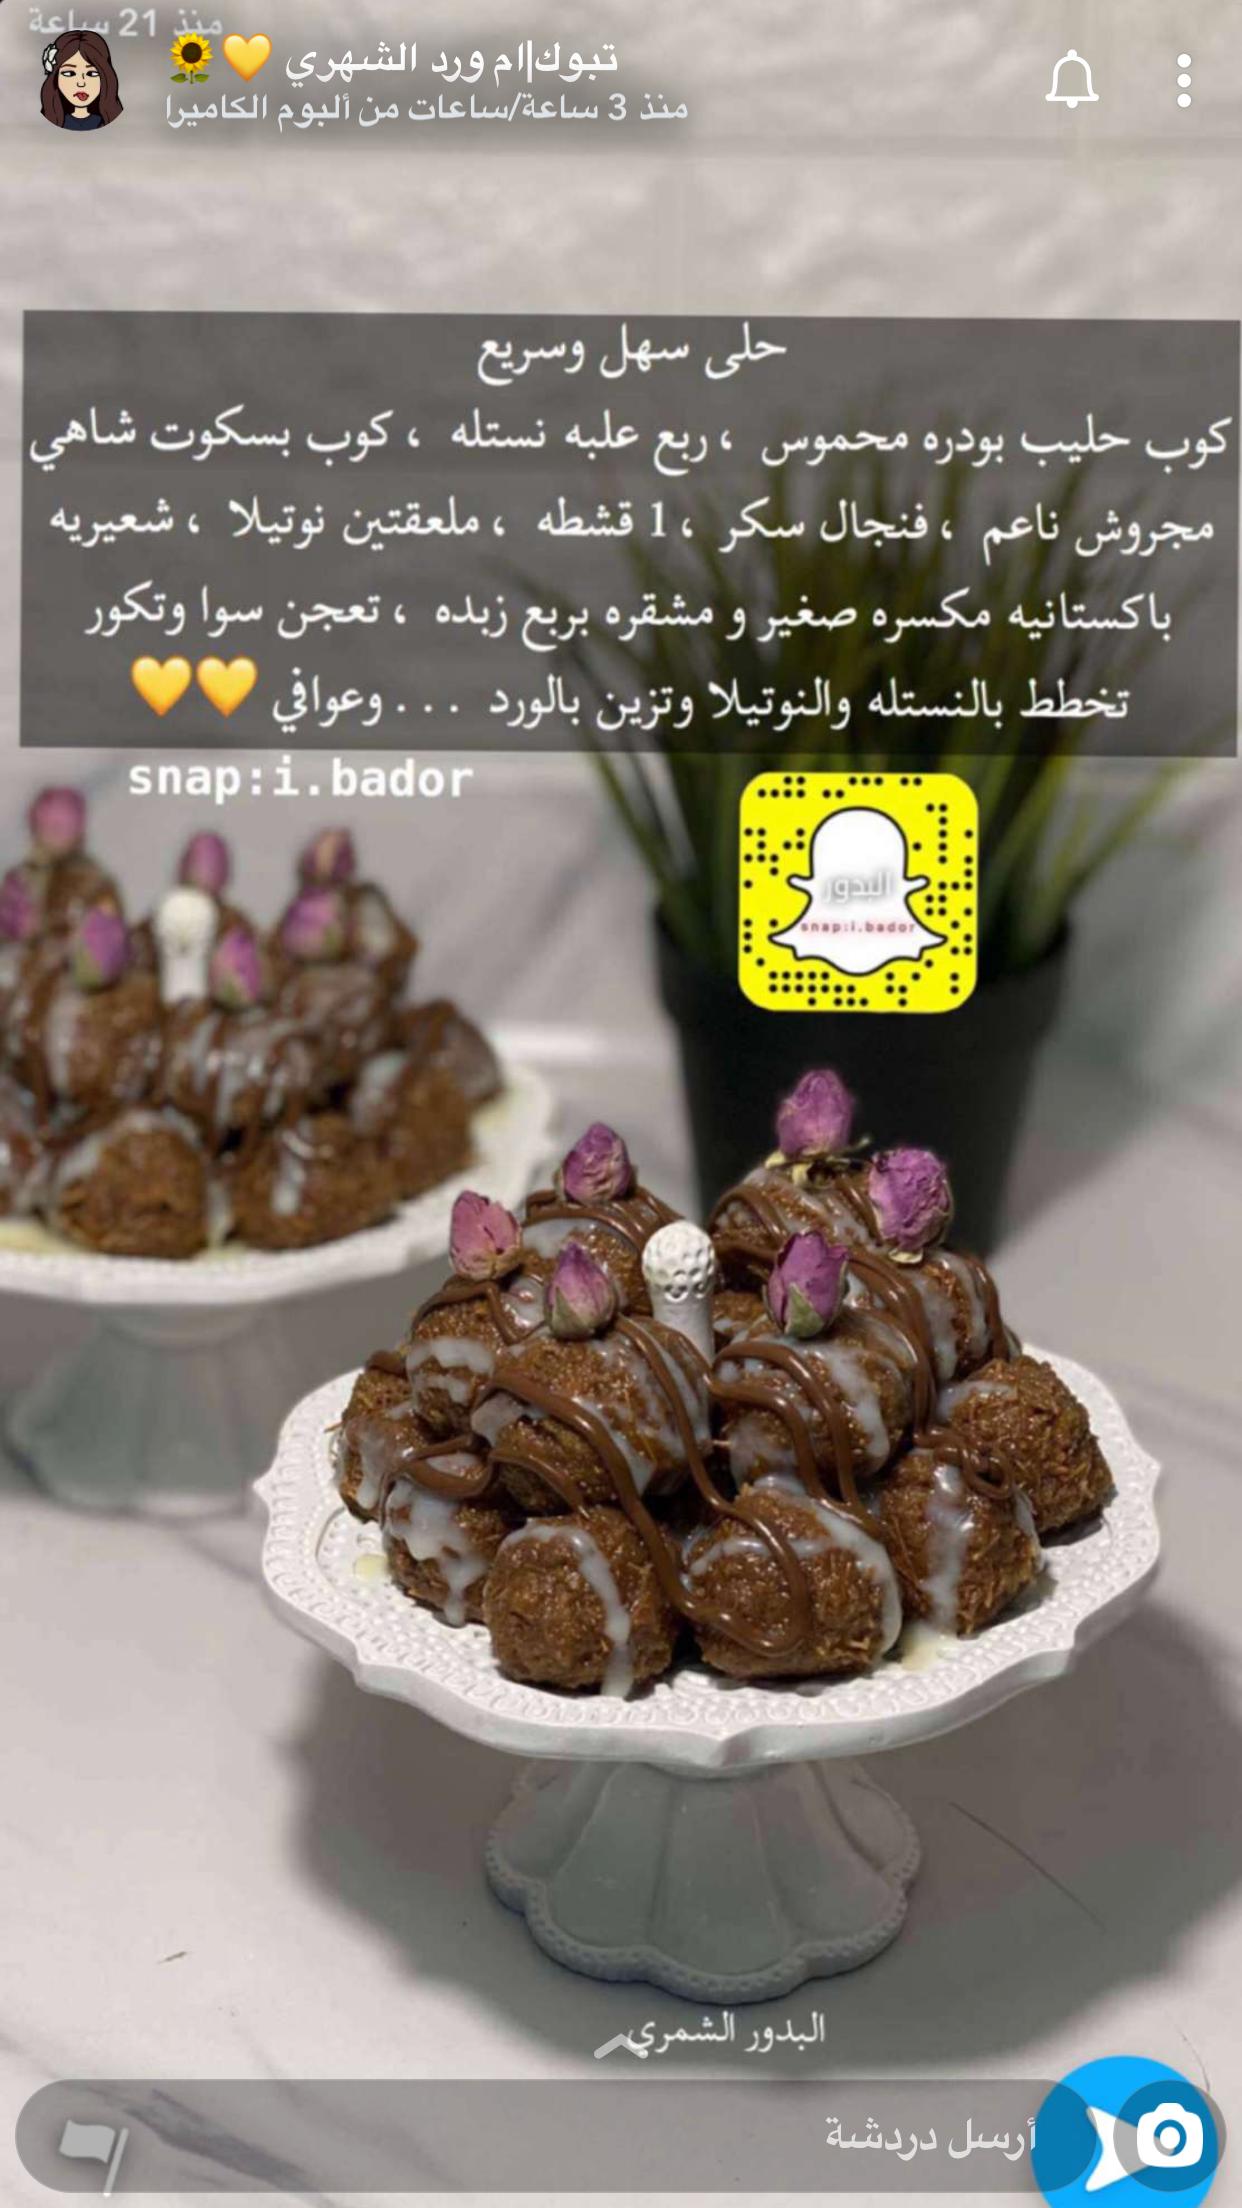 Pin By Jasmine Shadow On حلآ Yummy Food Dessert Food Receipes Food Recipies